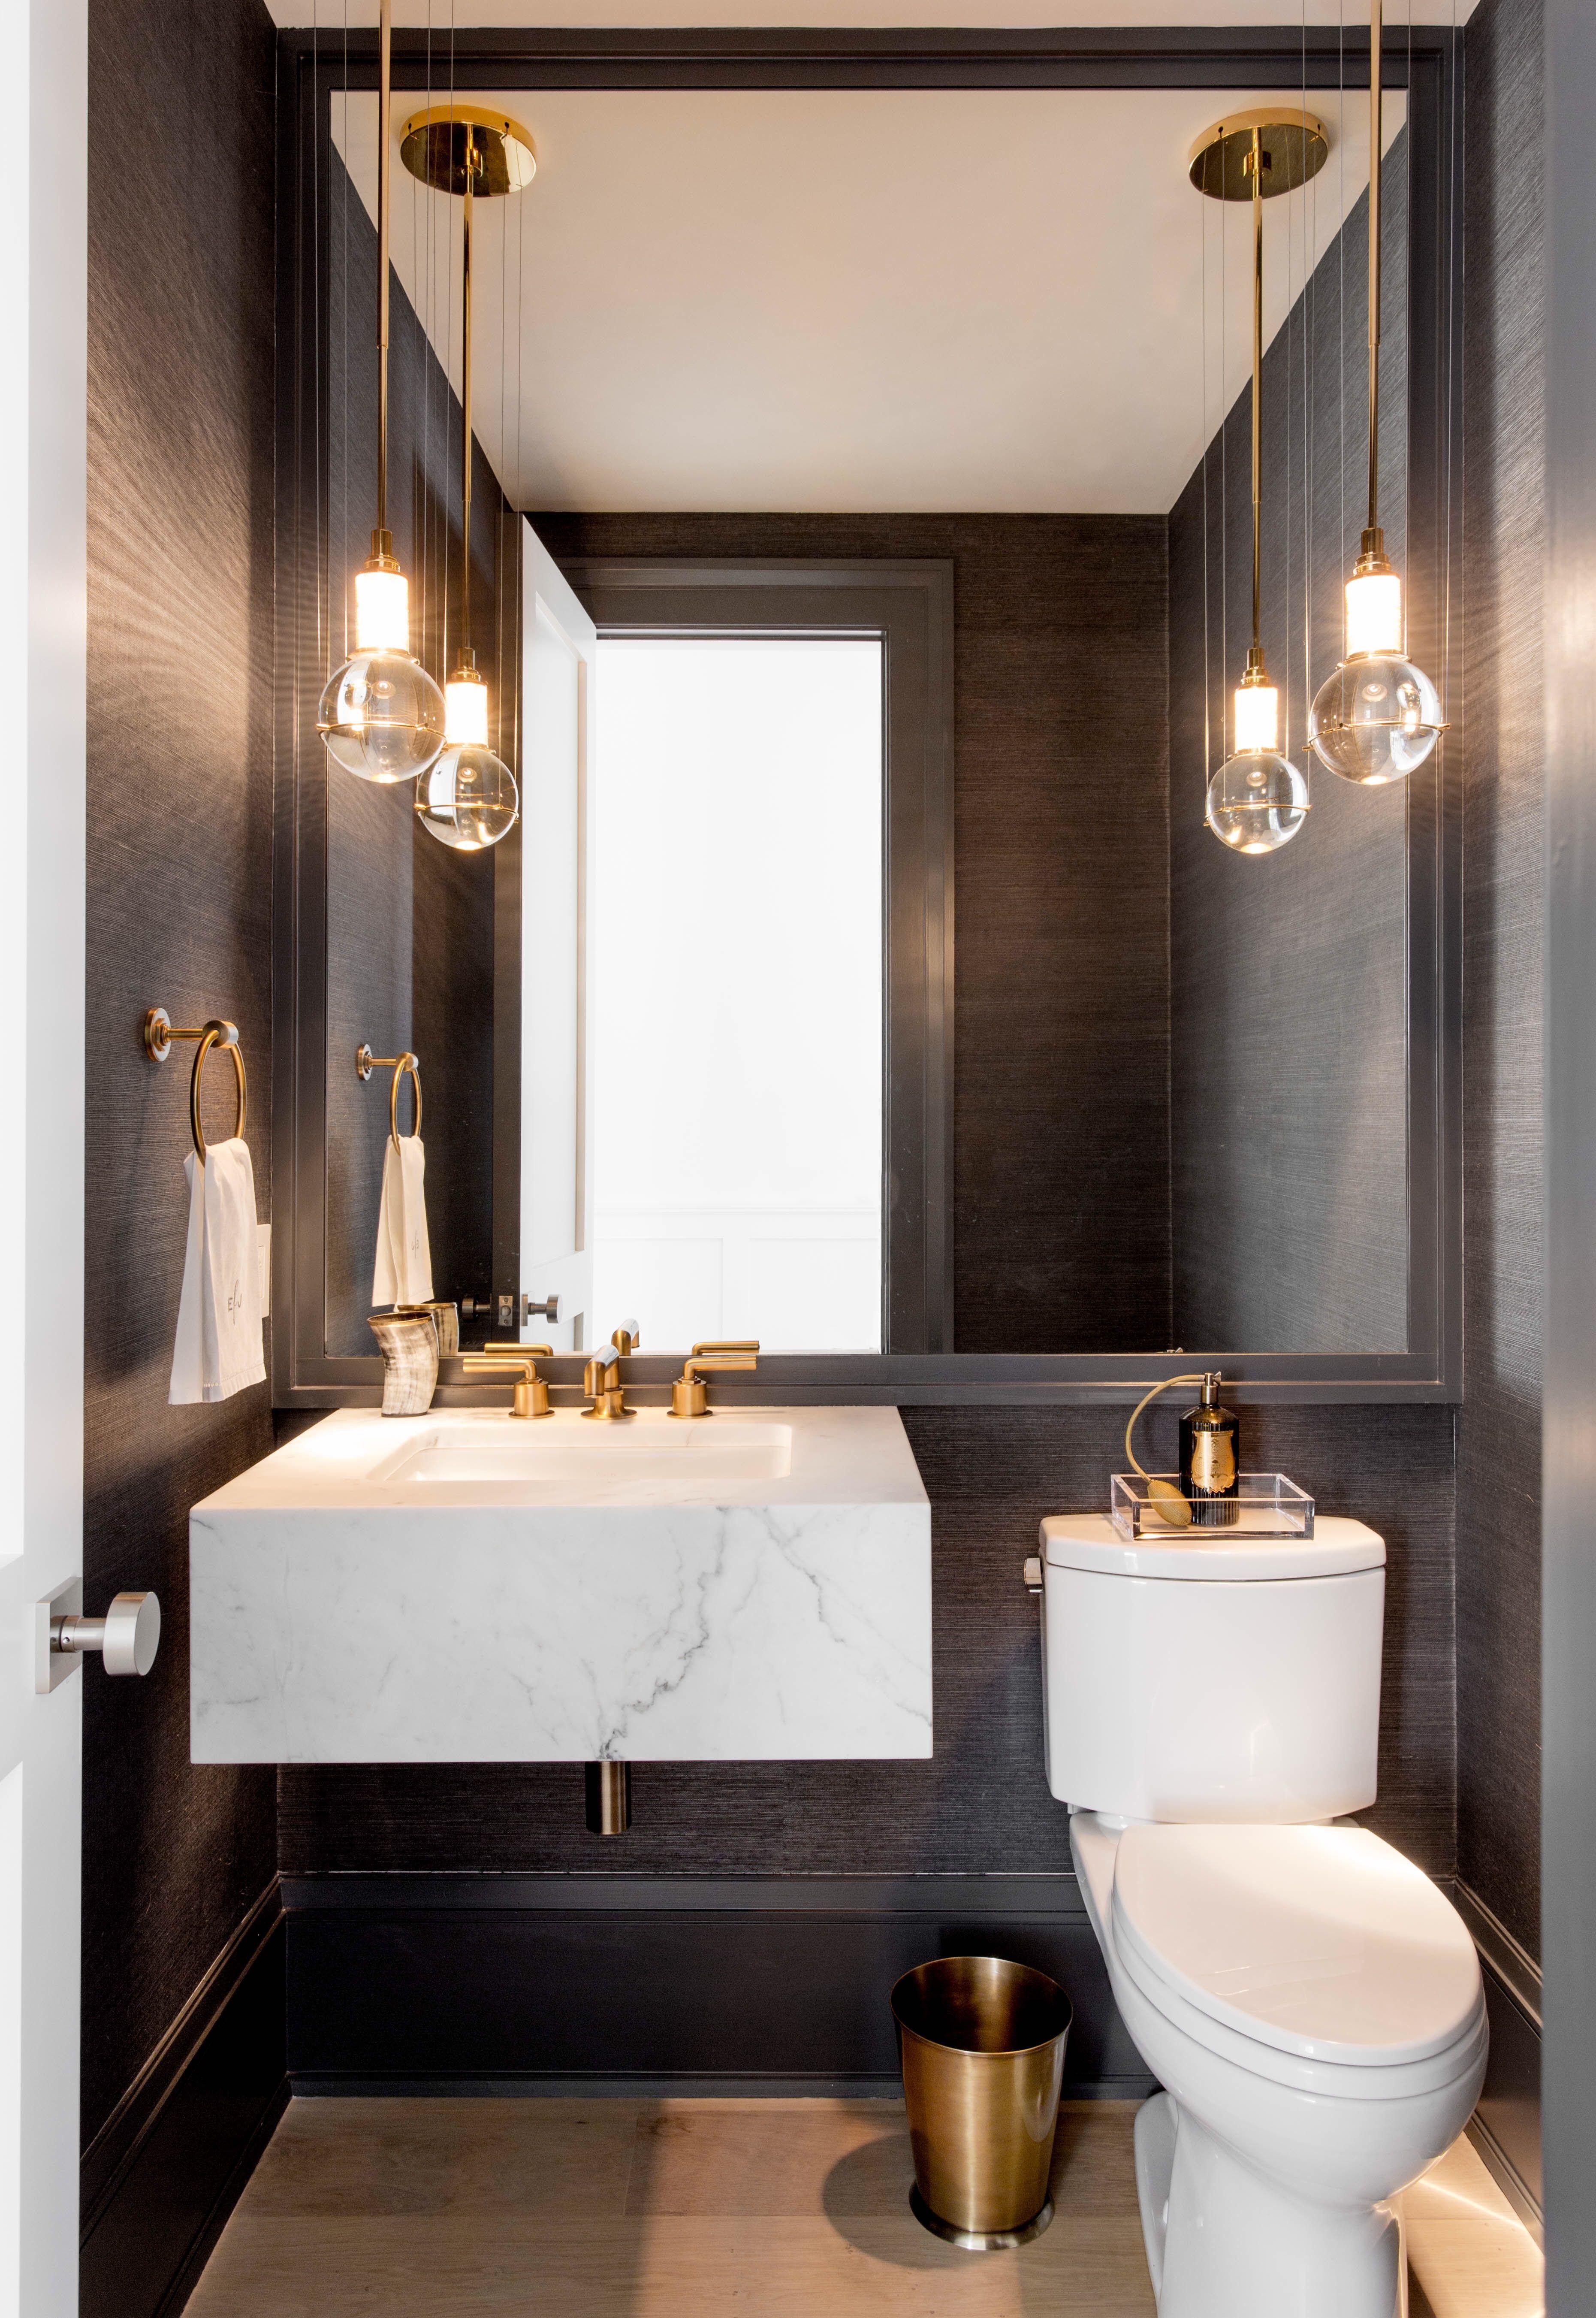 Homes Tamara Magel Powder Room Design Bathroom Interior